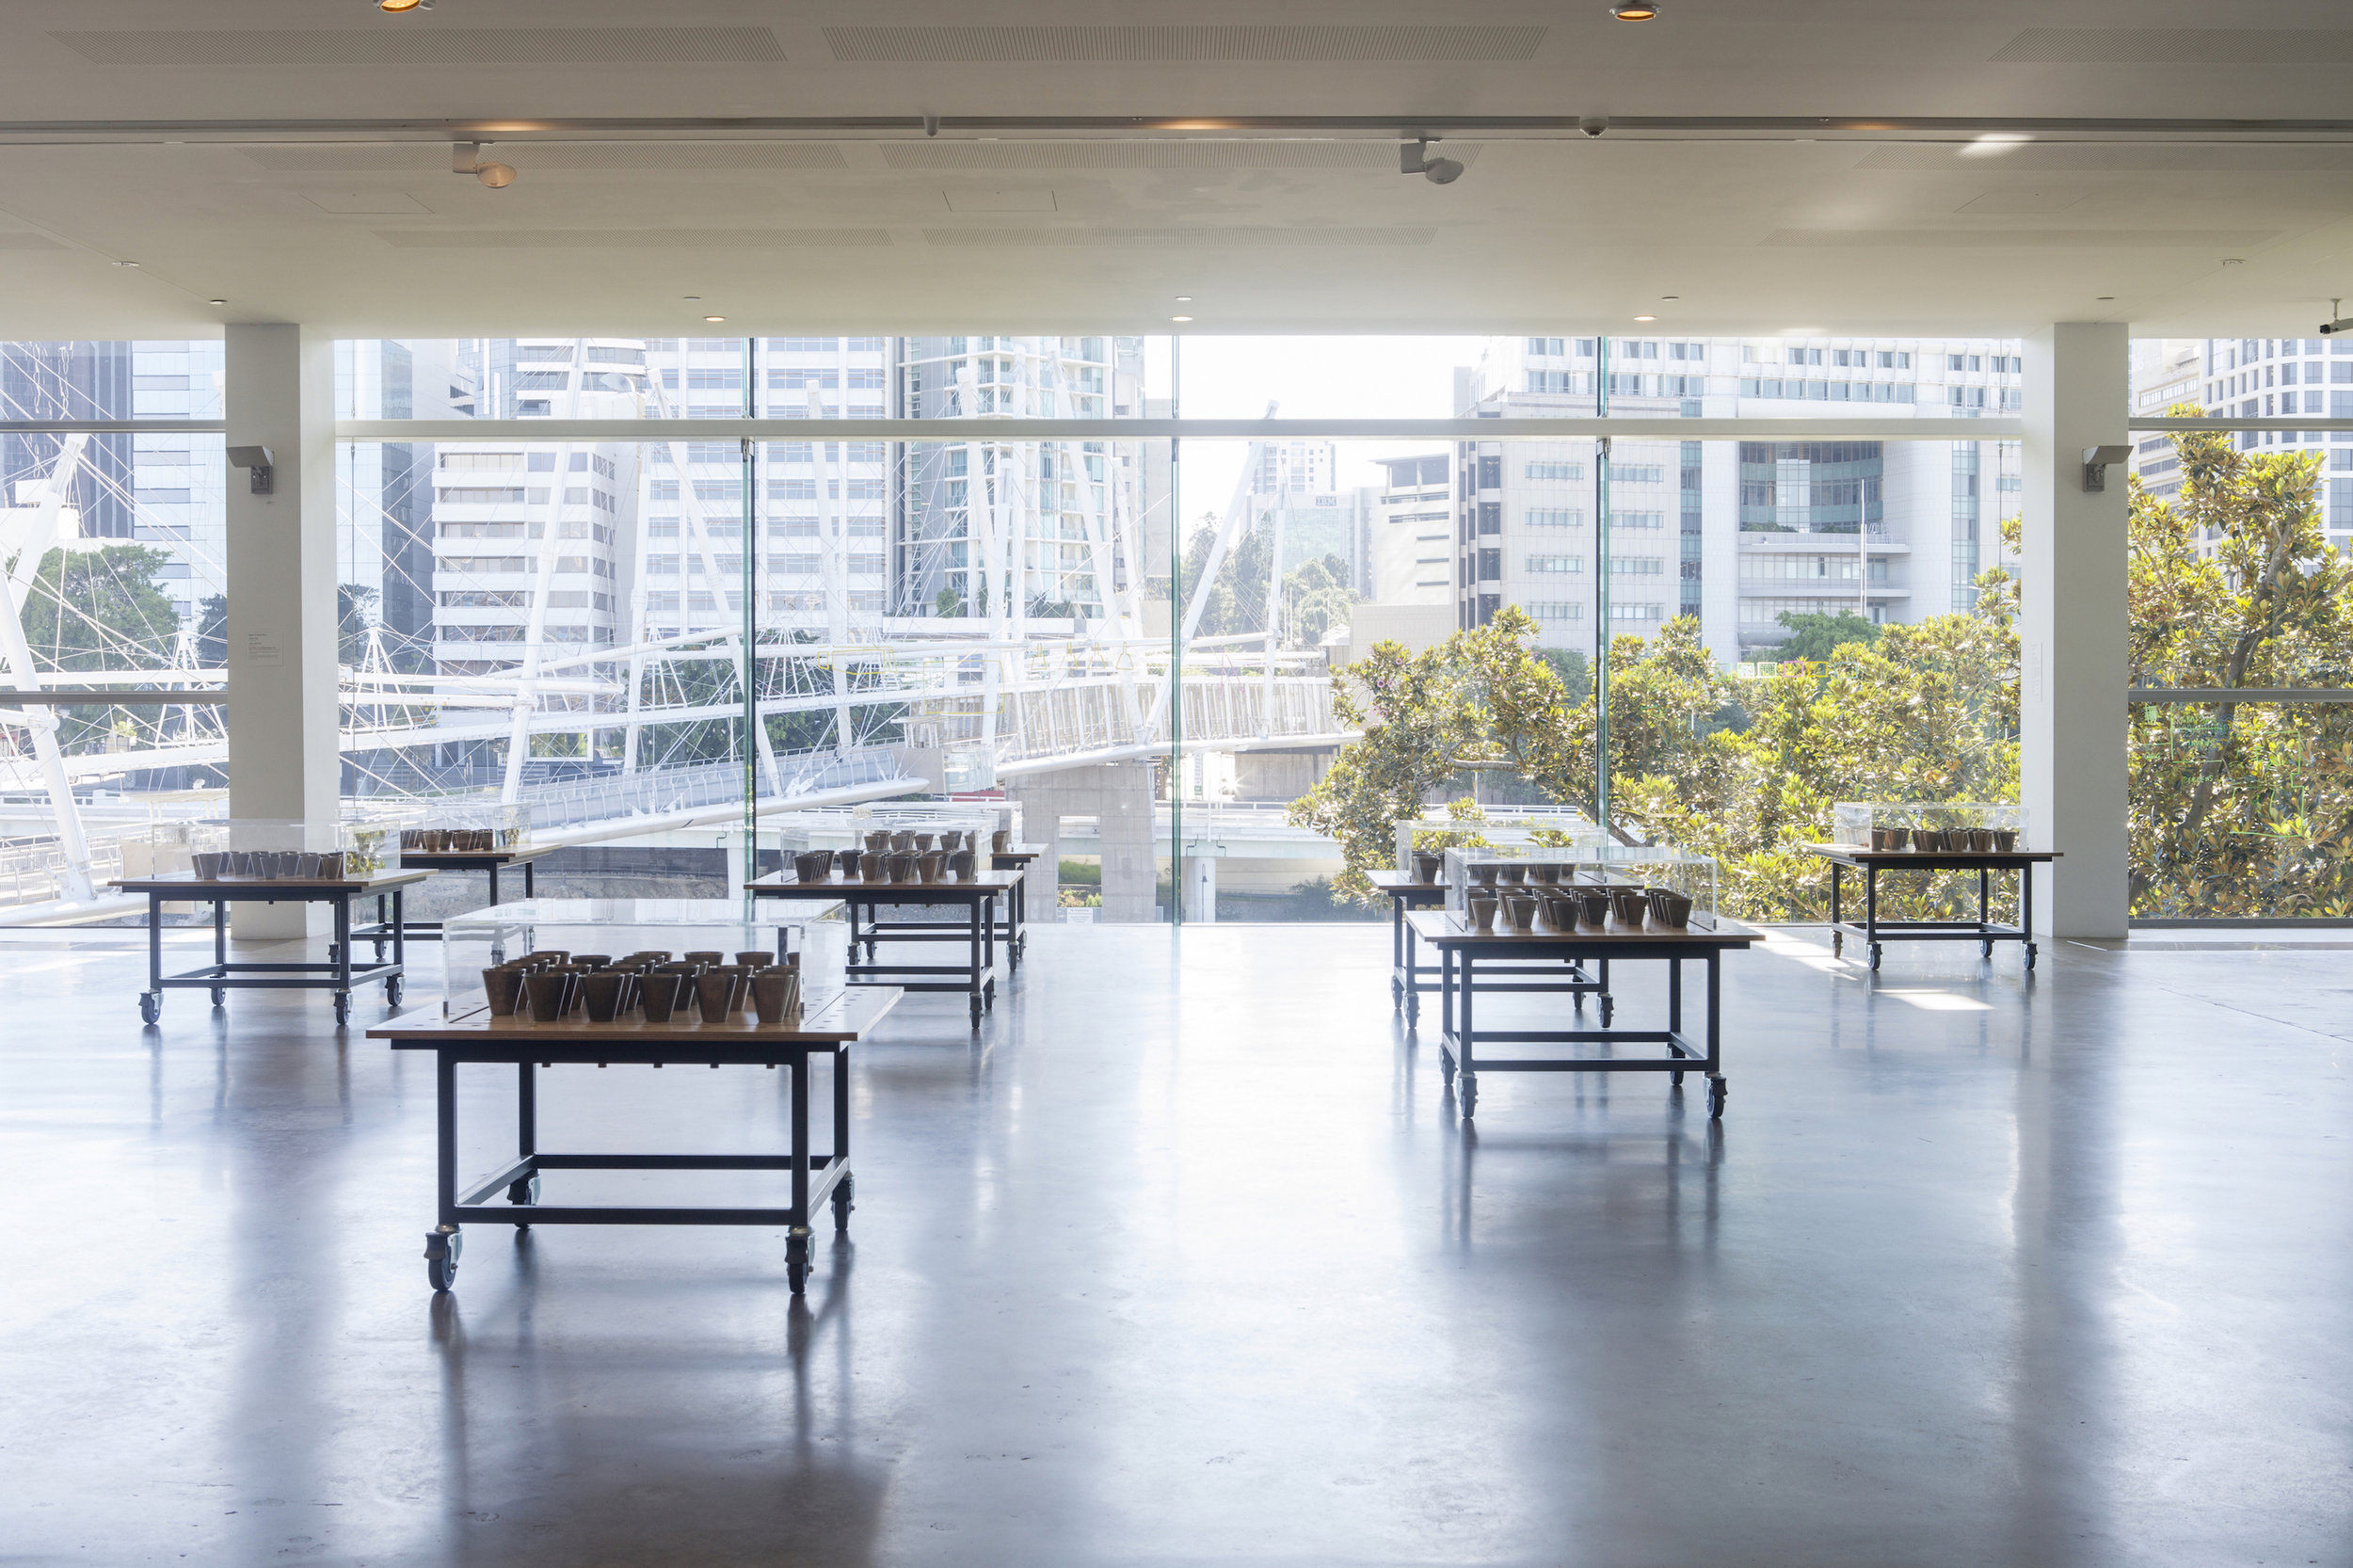 Open Plans: Coordinating Space  Queensland Art Gallery of Modern Art, Brisbane